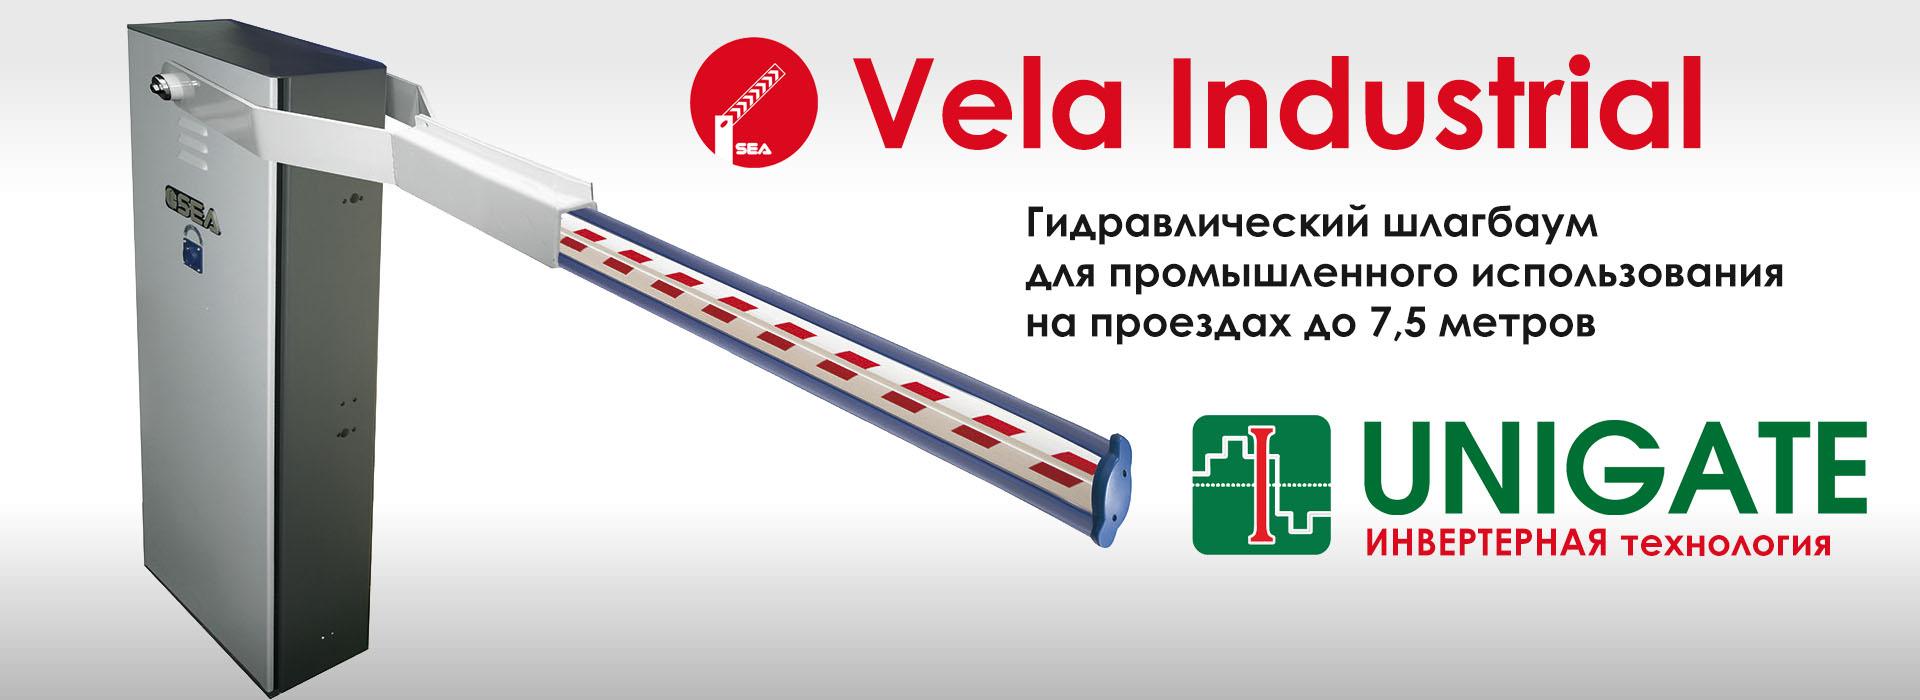 Баннер. Шлагбаум SEA Vela Industriale с инверторной технологией